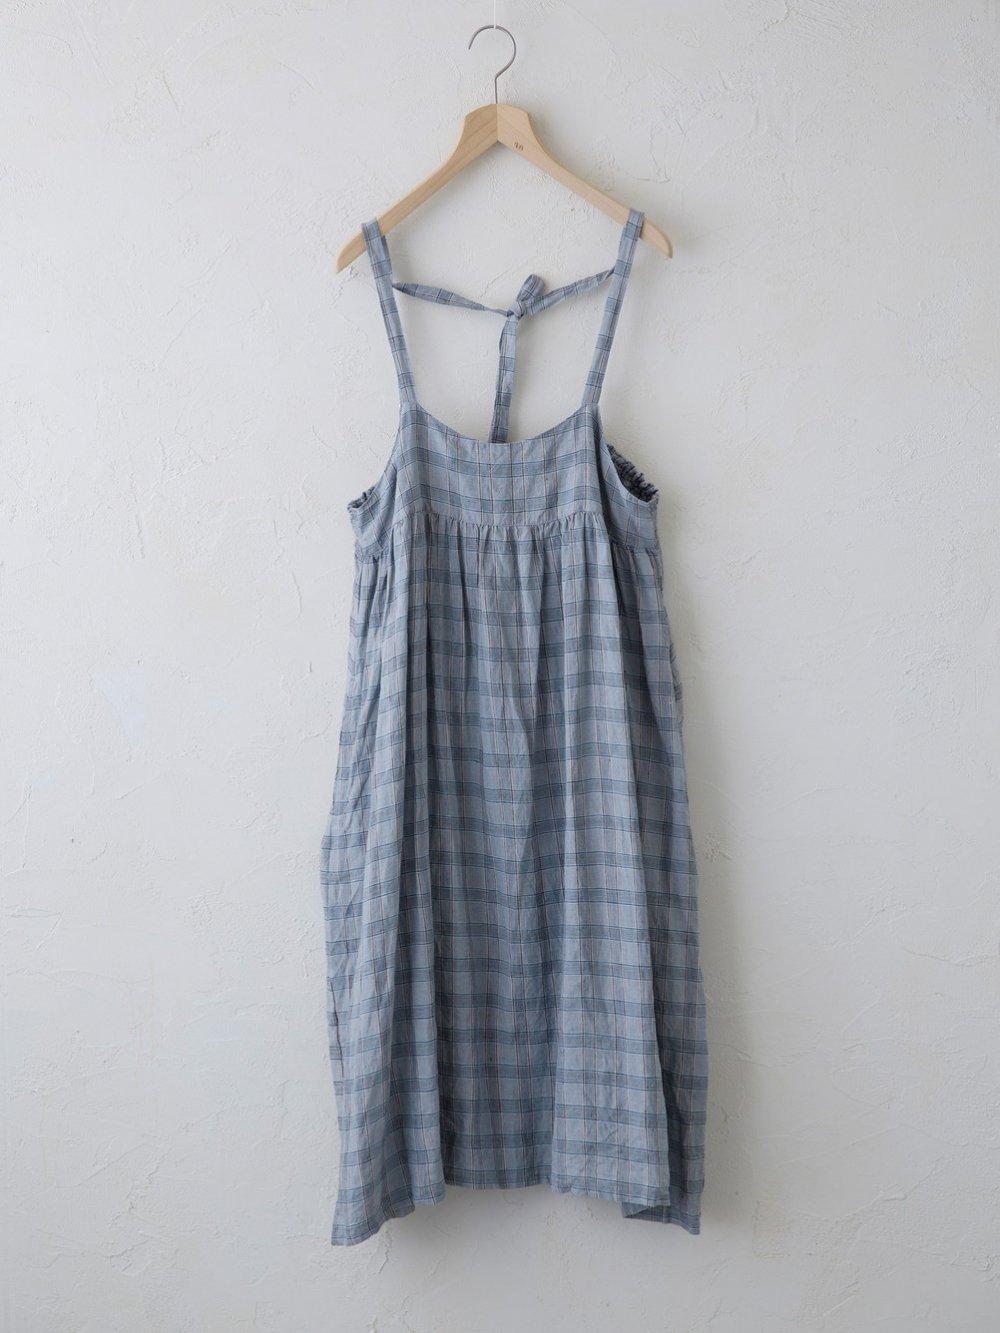 Vintage Check キャミワンピース